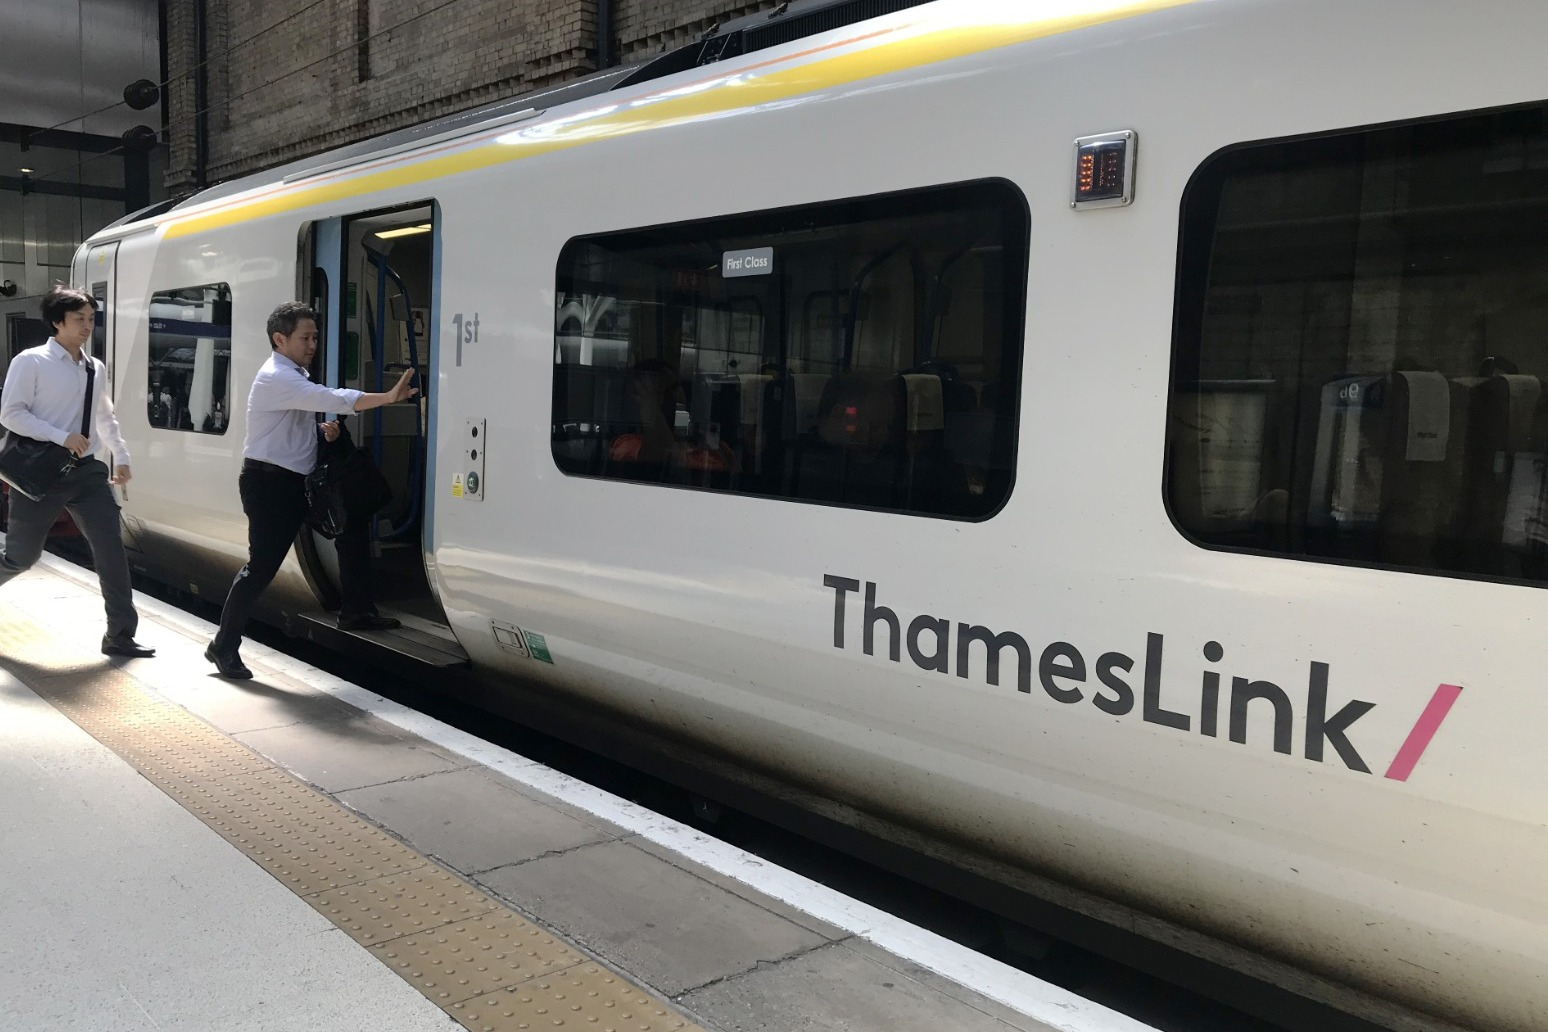 Rail fares increased across Britain despite low demand for travel